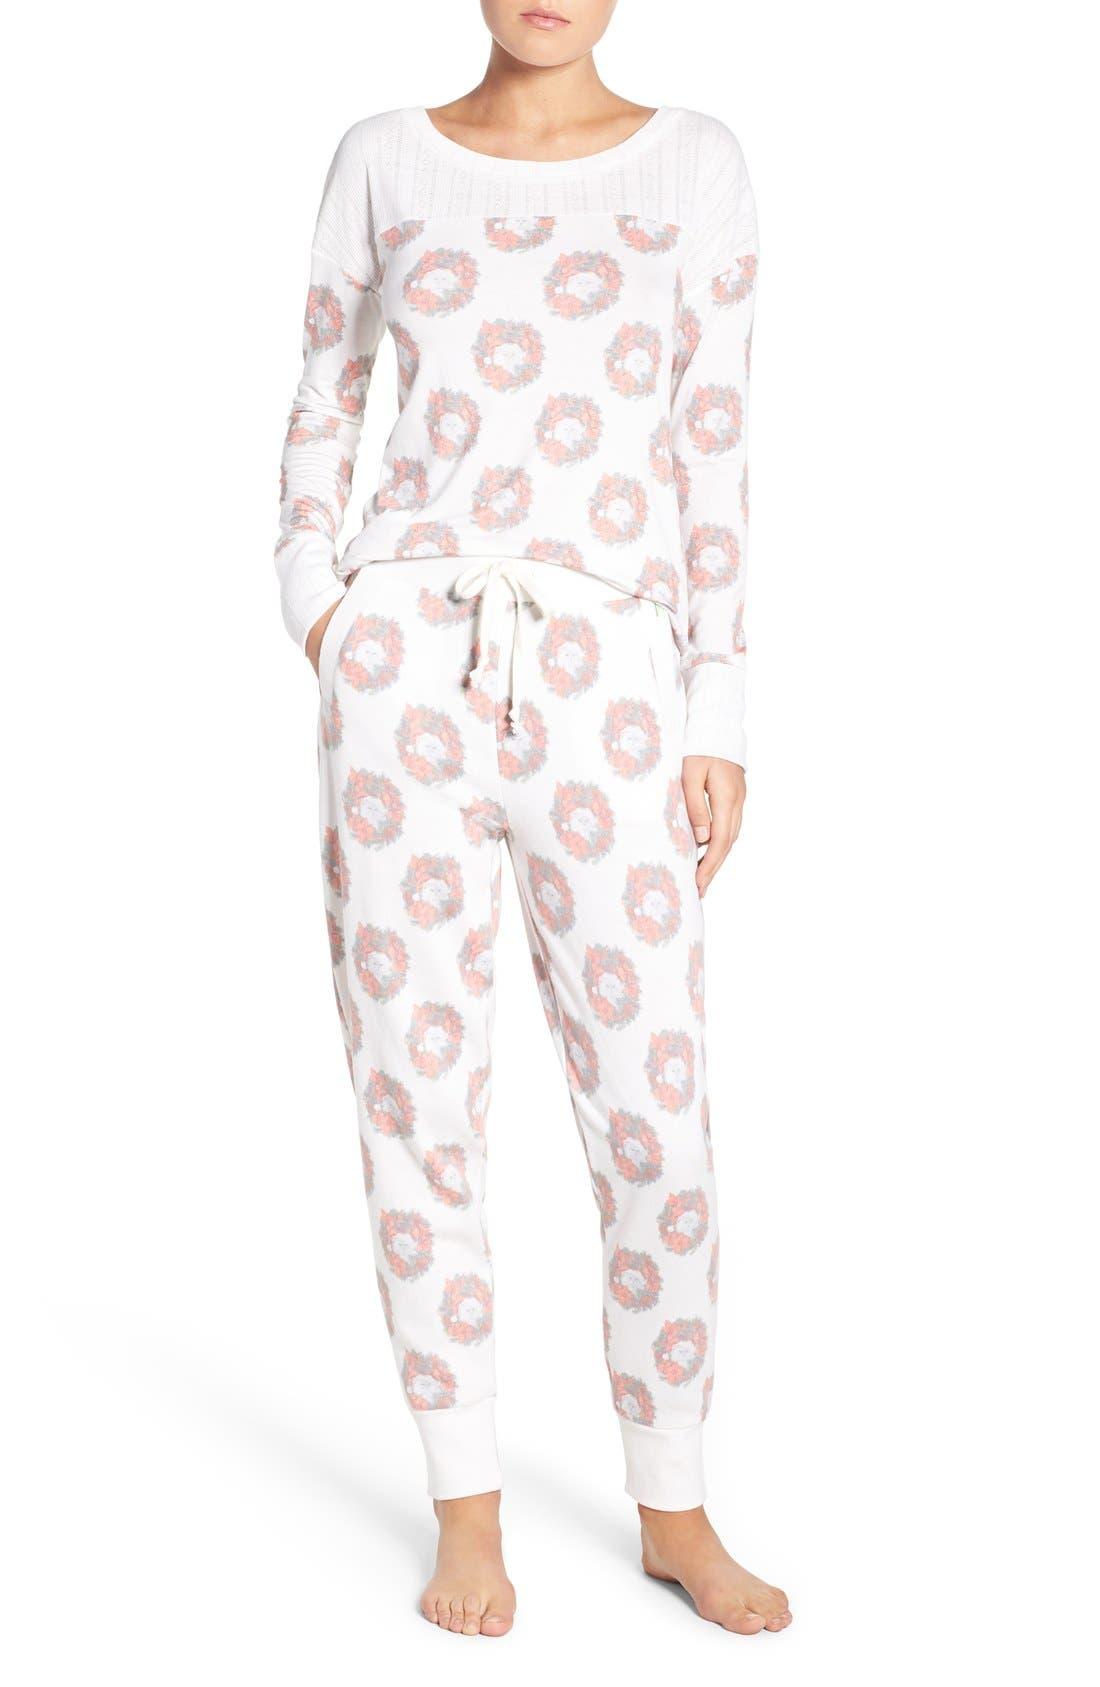 Alternate Image 1 Selected - Honeydew Intimates Fleece Pajamas